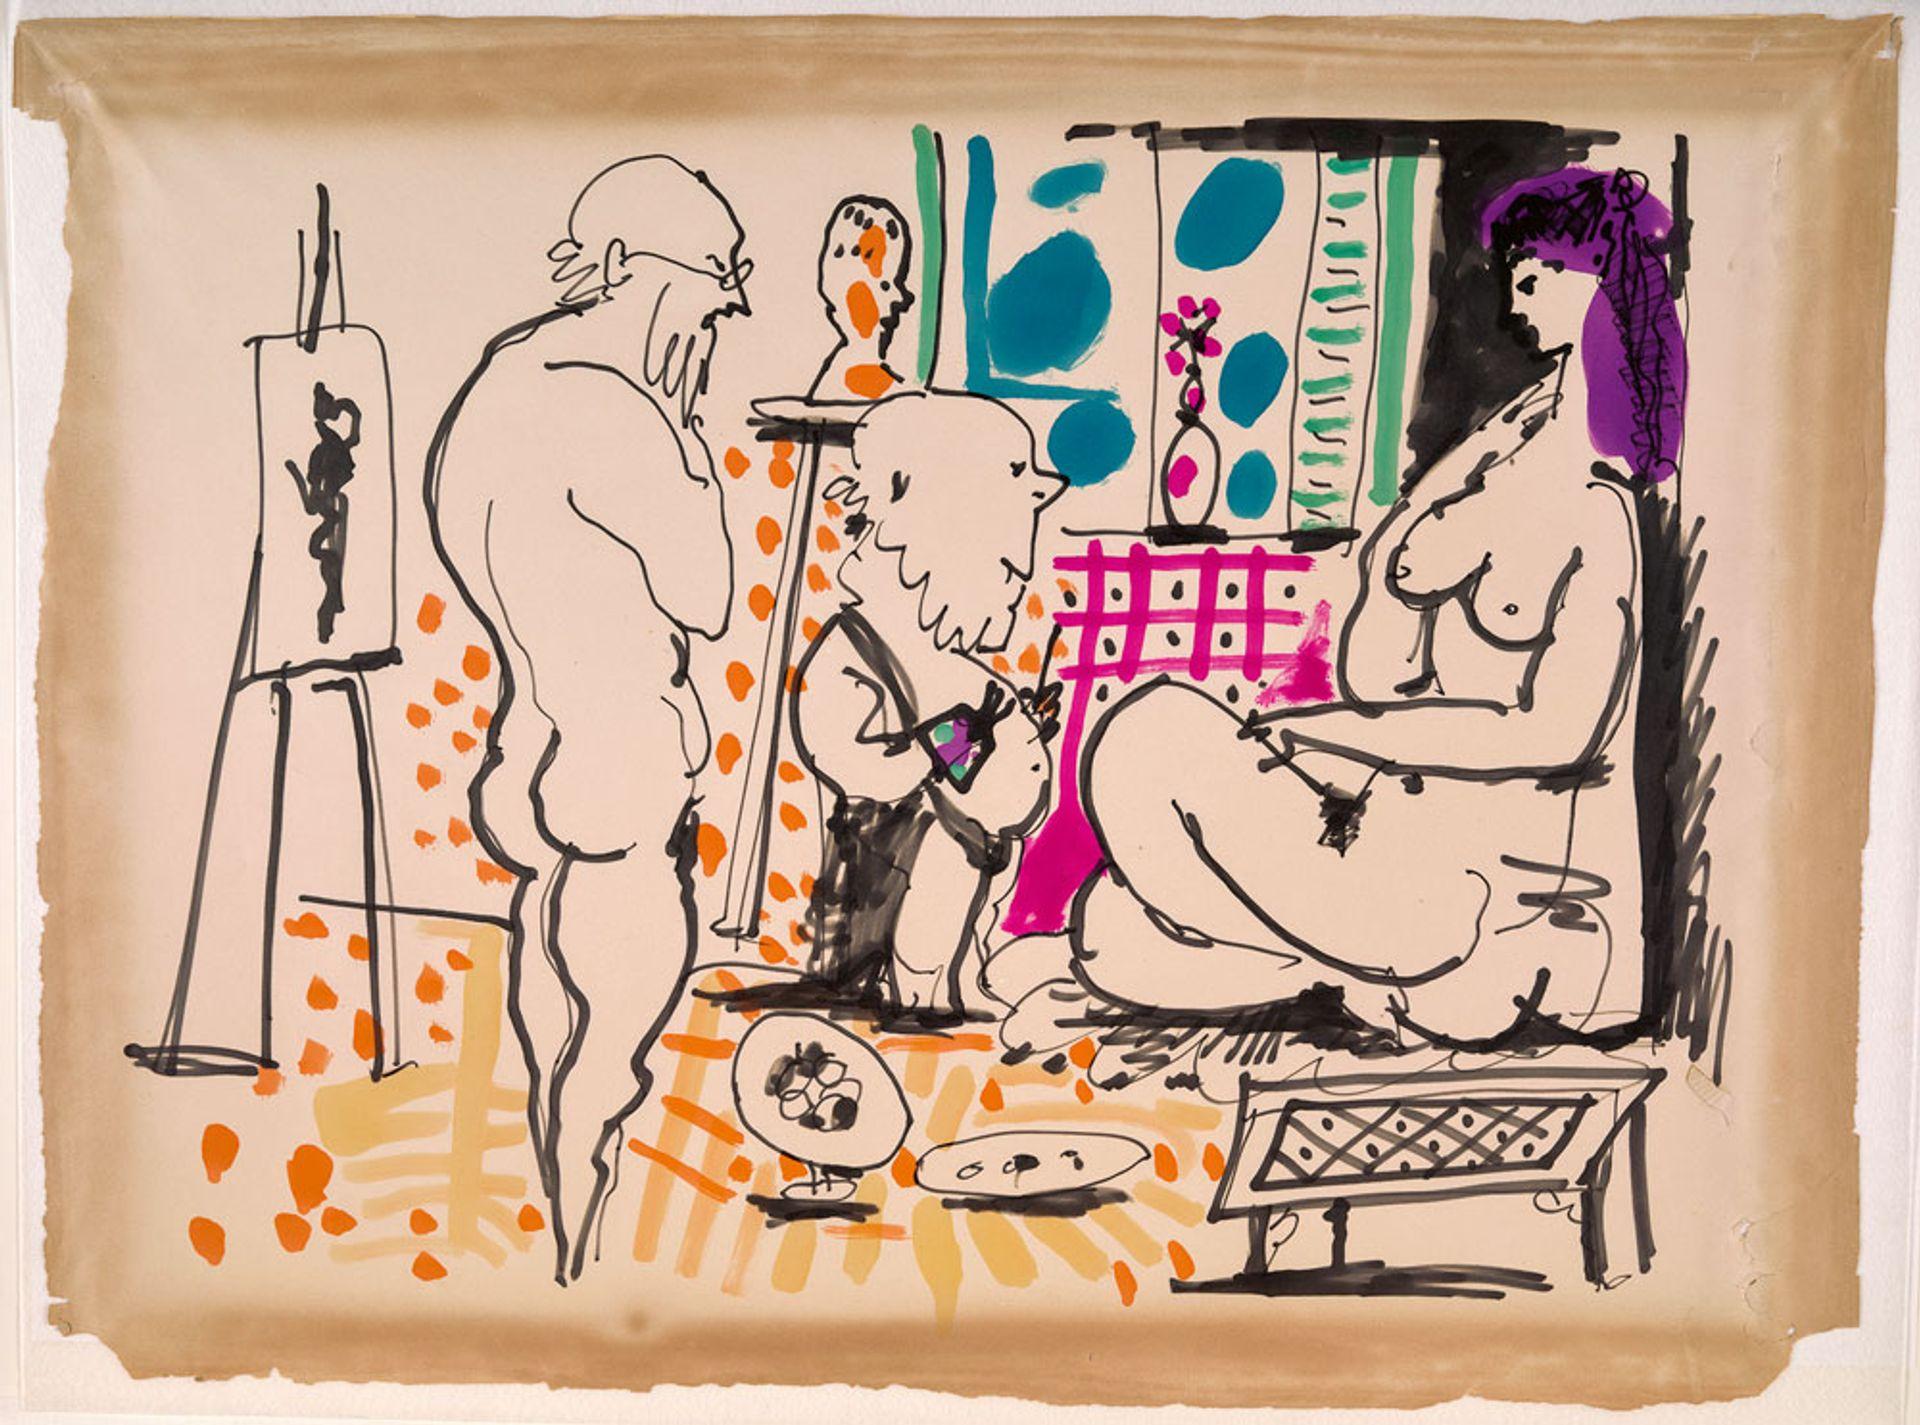 Pablo Picasso's In the Studio (1955) Musée National Picasso-Paris; © Succession Picasso/DACS; photo: Adrien Didierjean/RMN, Grand Palais